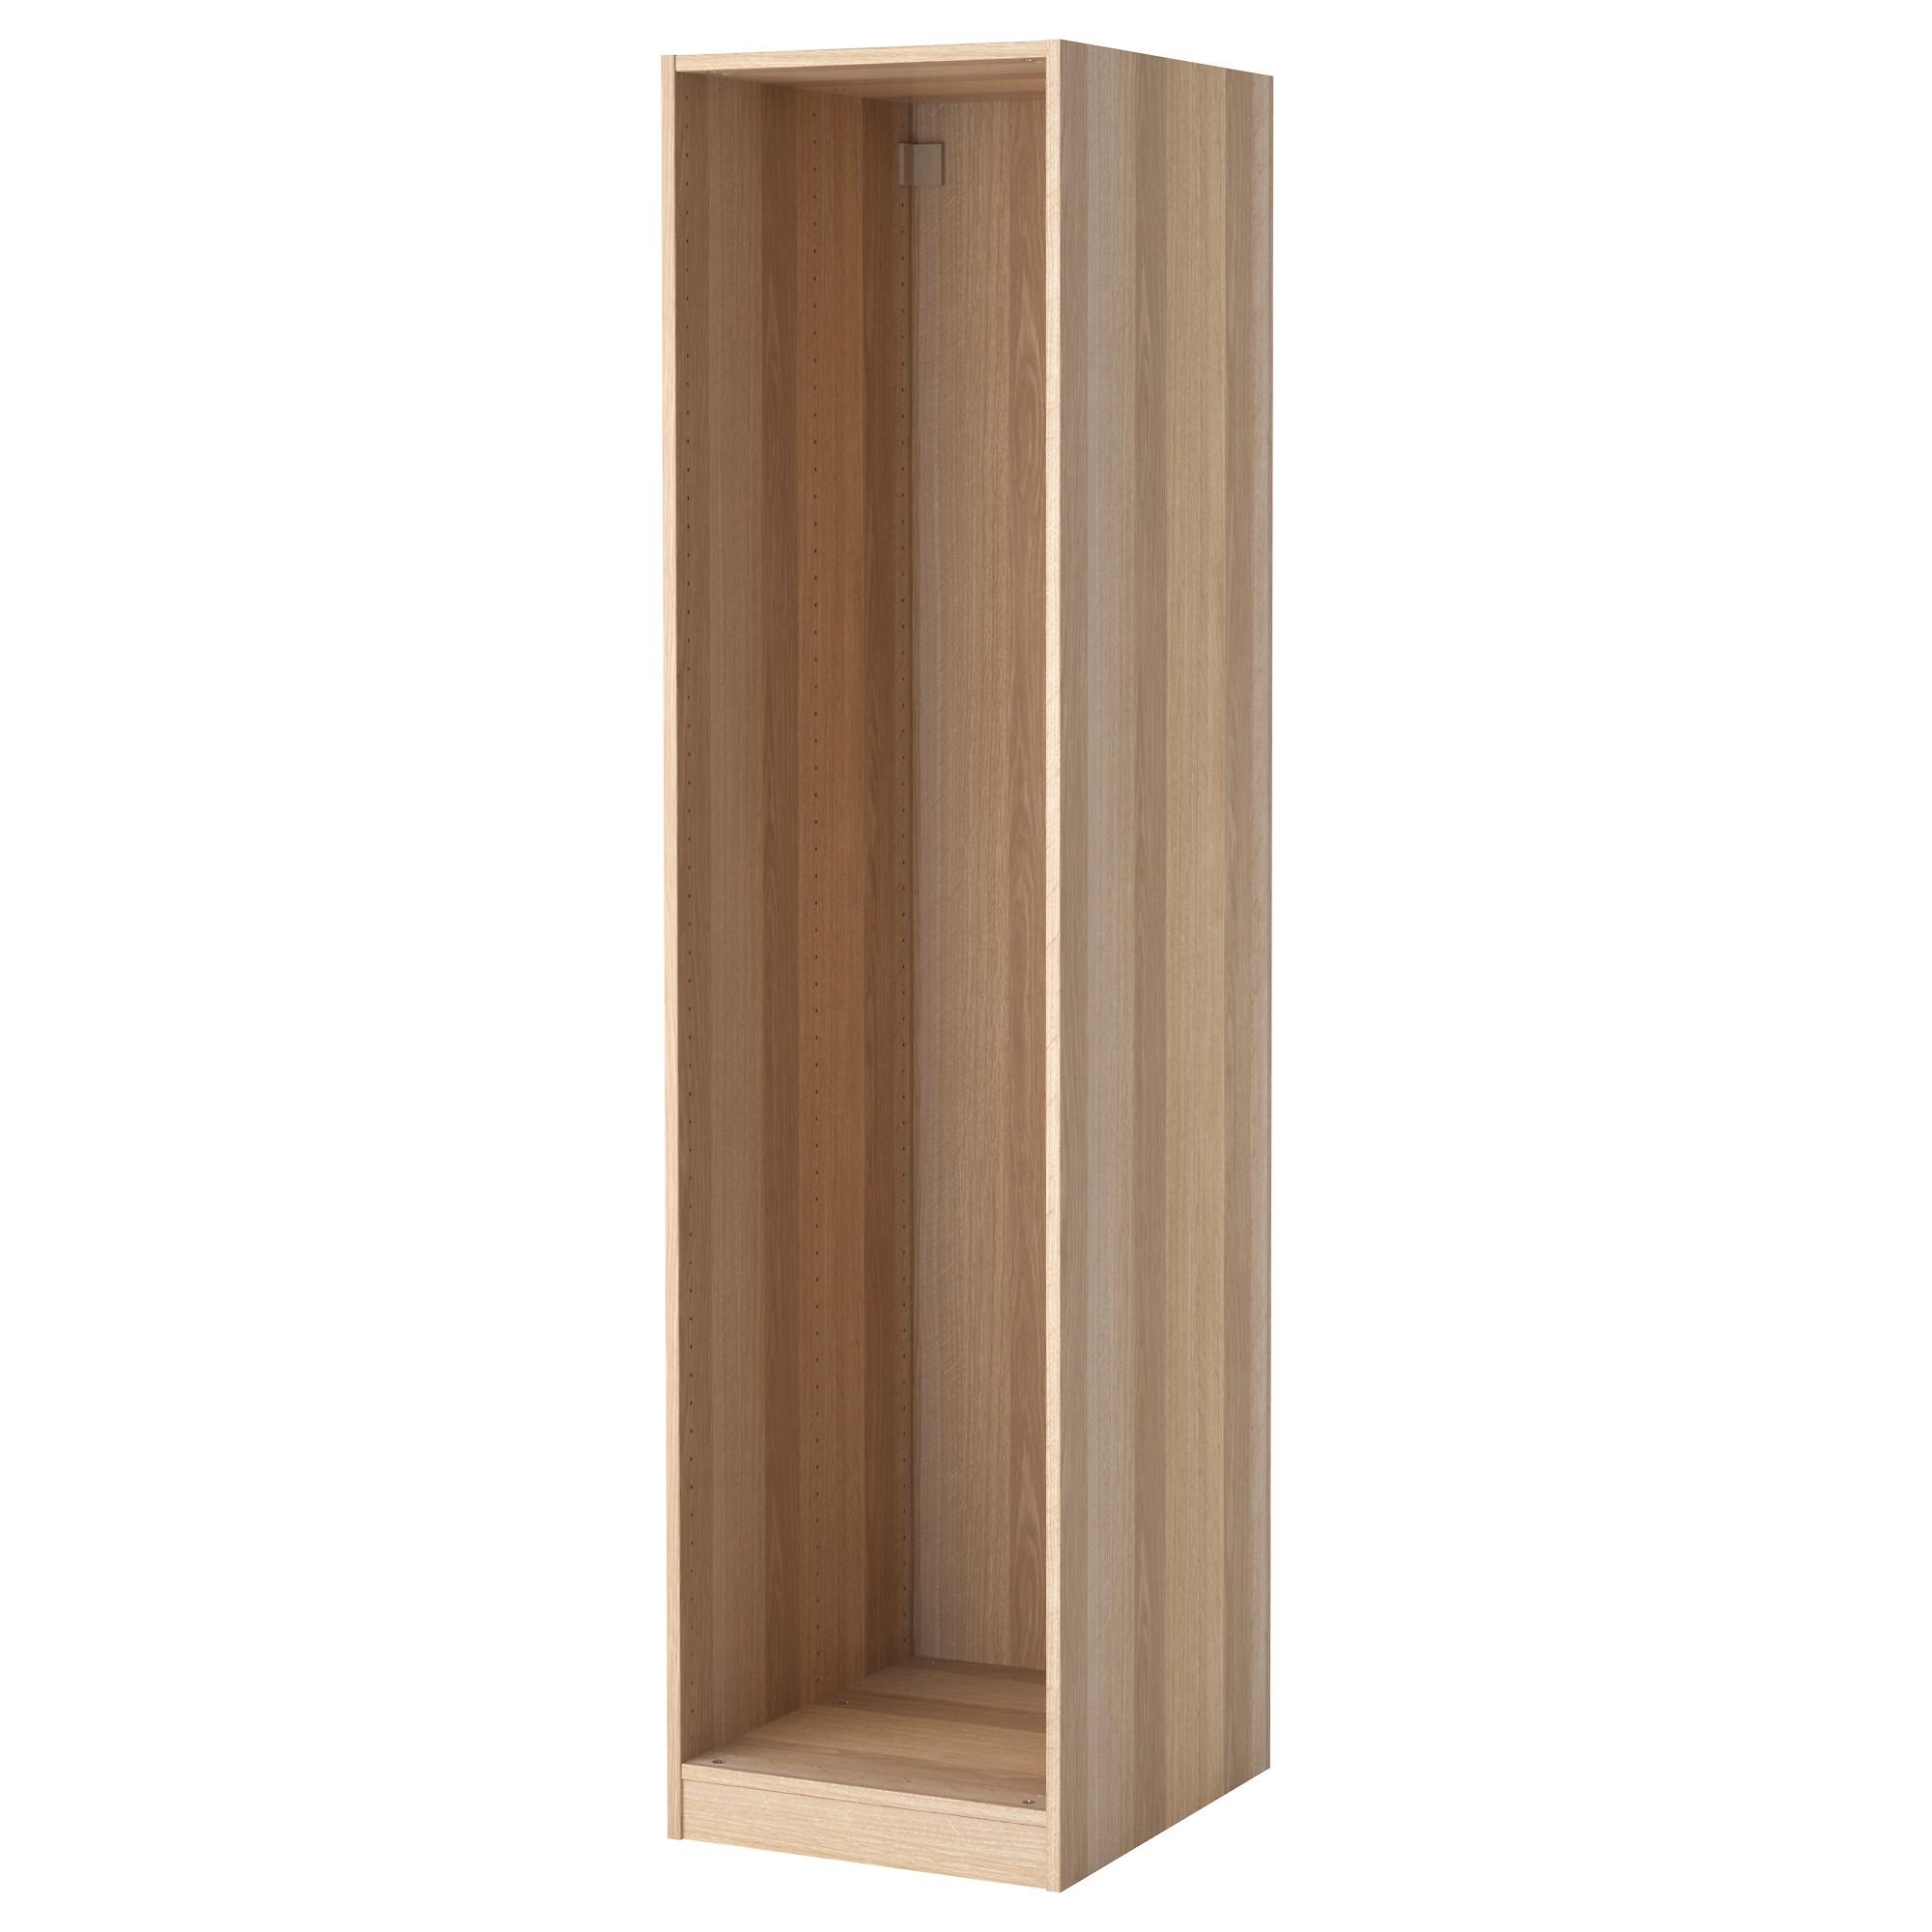 Furniture And Home Furnishings Inneneinrichtung Ikea Pax Und